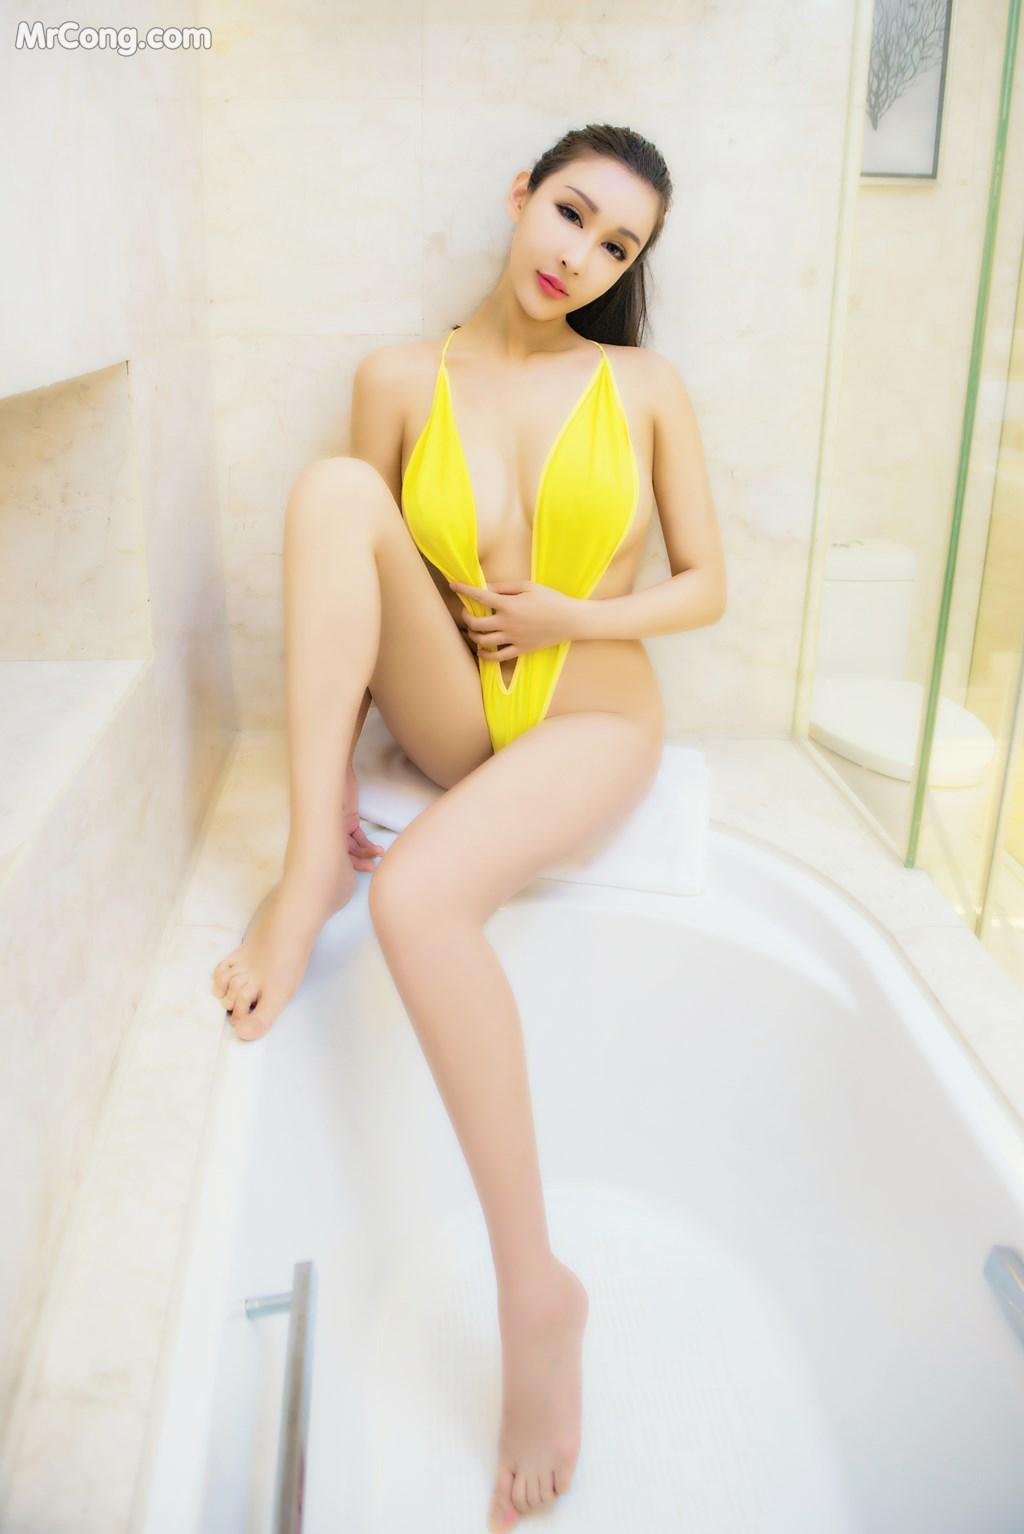 Image SLADY-2017-06-29-No.015-Man-Su-La-Na-MrCong.com-010 in post SLADY 2017-06-29 No.015: Người mẫu Man Su La Na (曼苏拉娜) (49 ảnh)